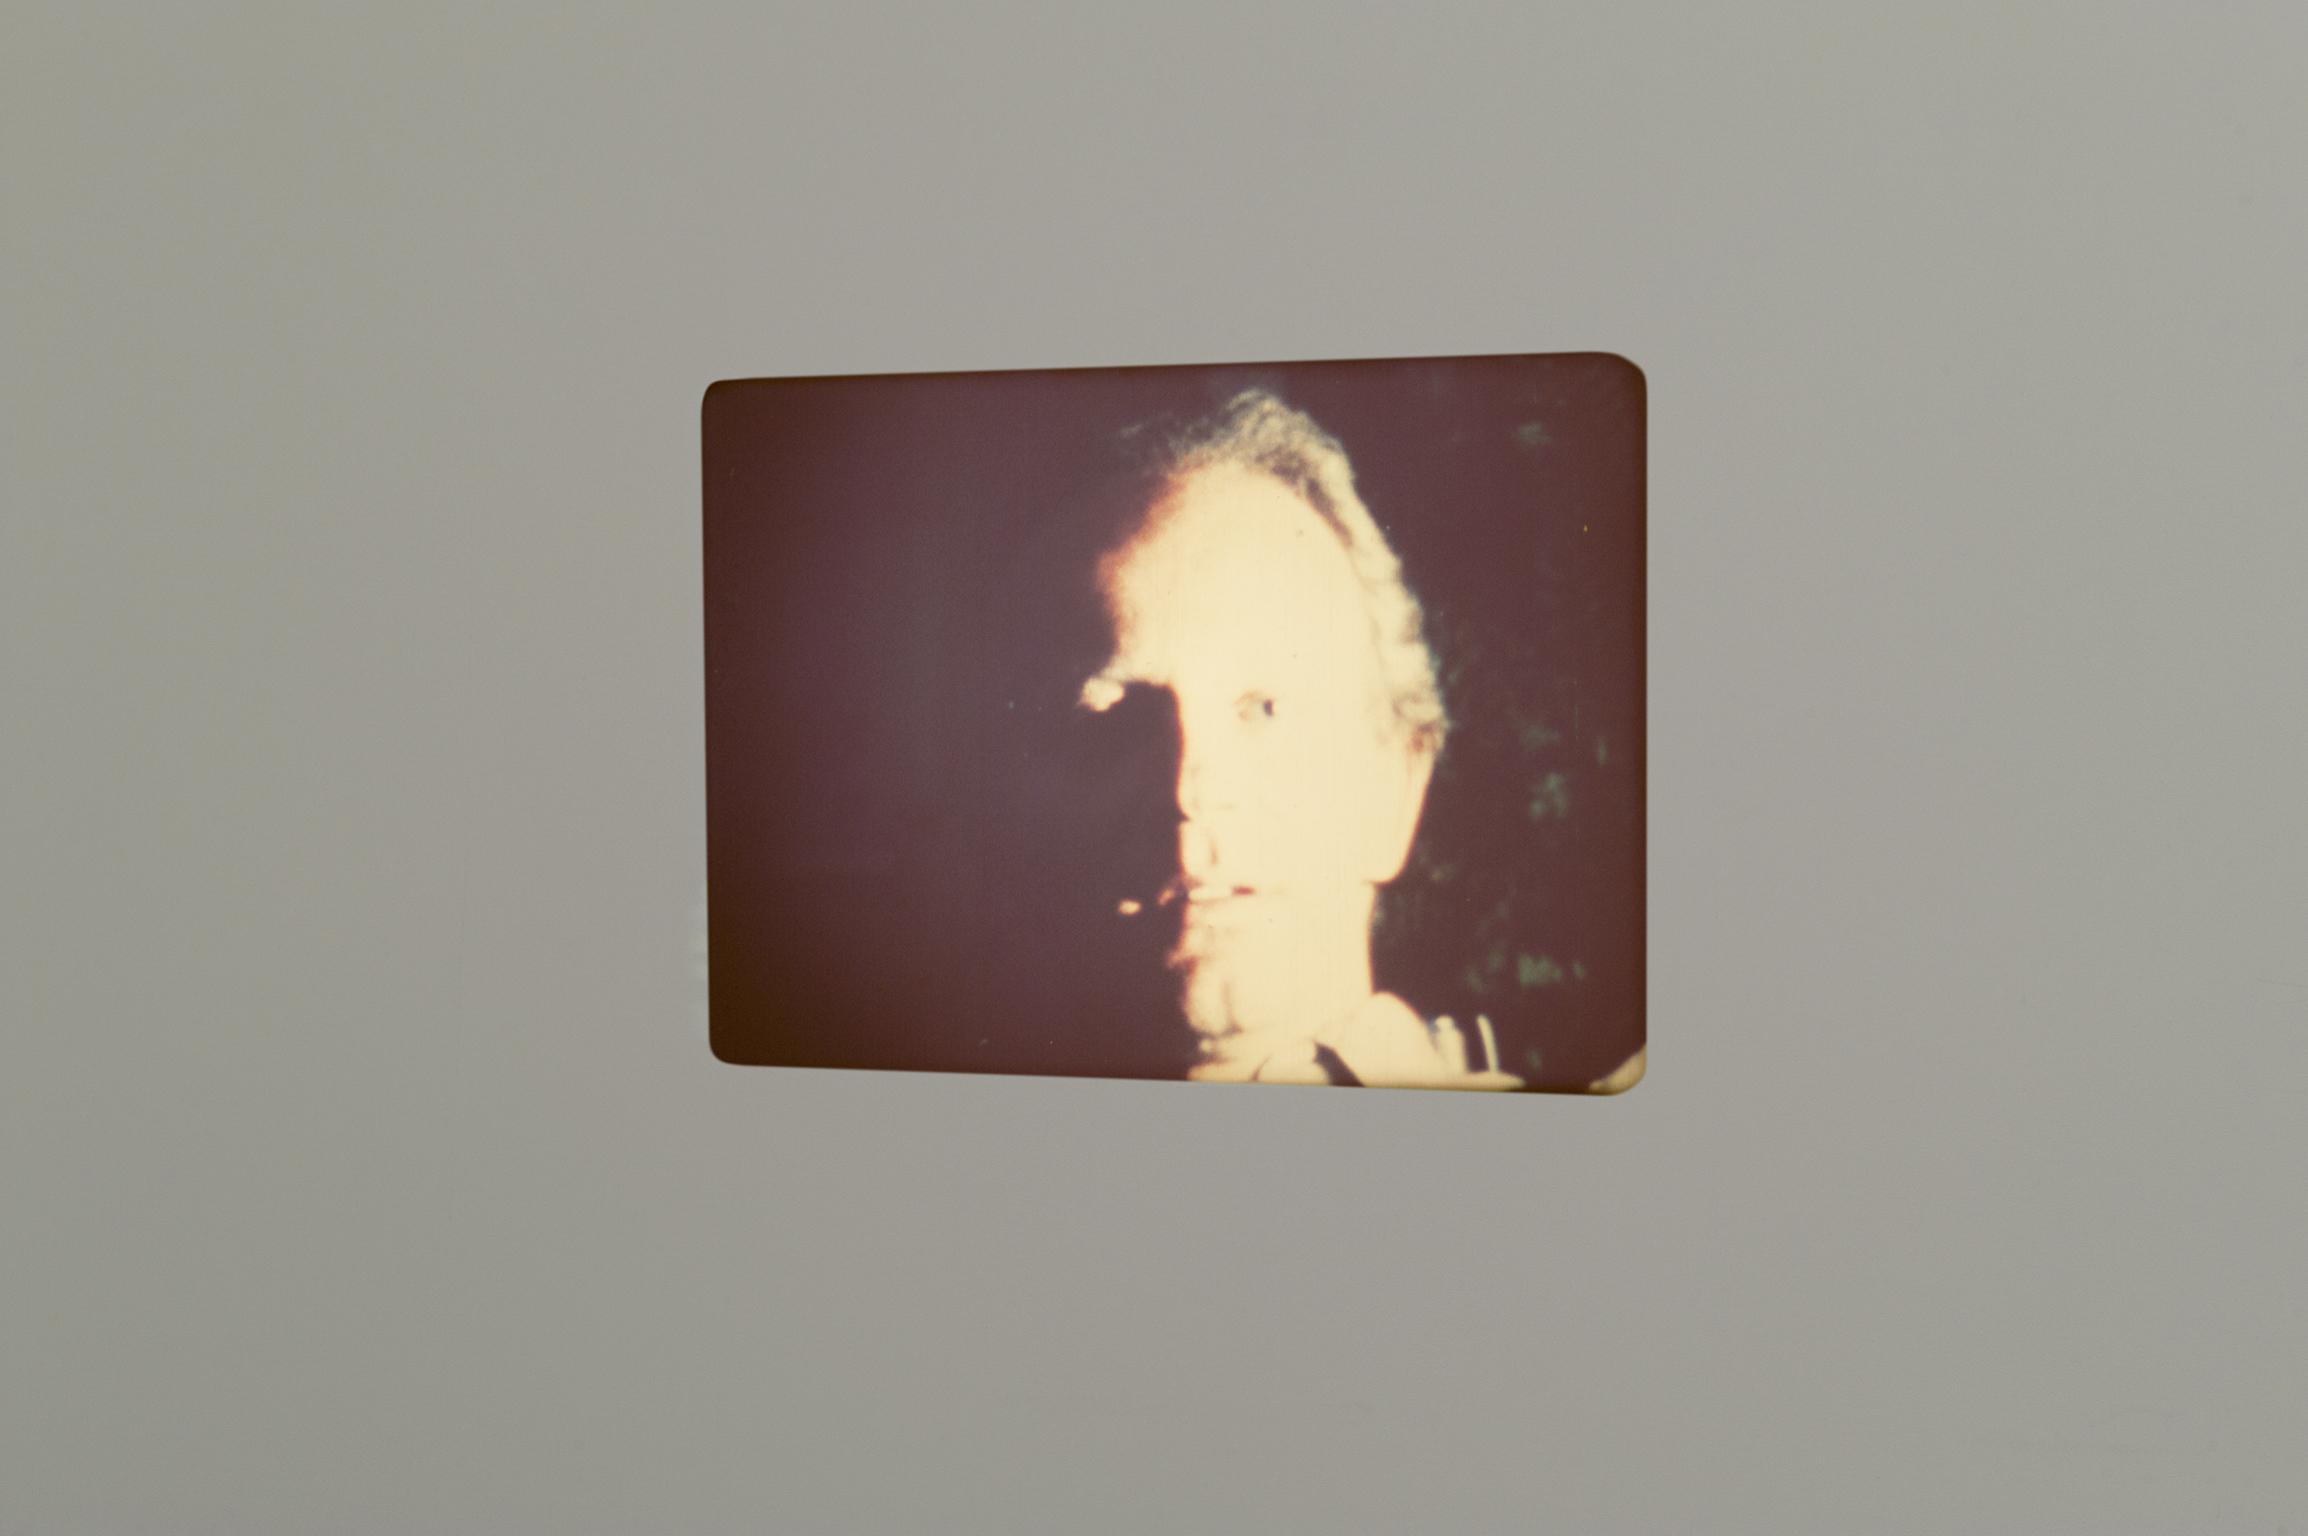 Robert Kleyn, Flash Portrait, 1976, super 8 film transferred to 16mm, dimensions variable by